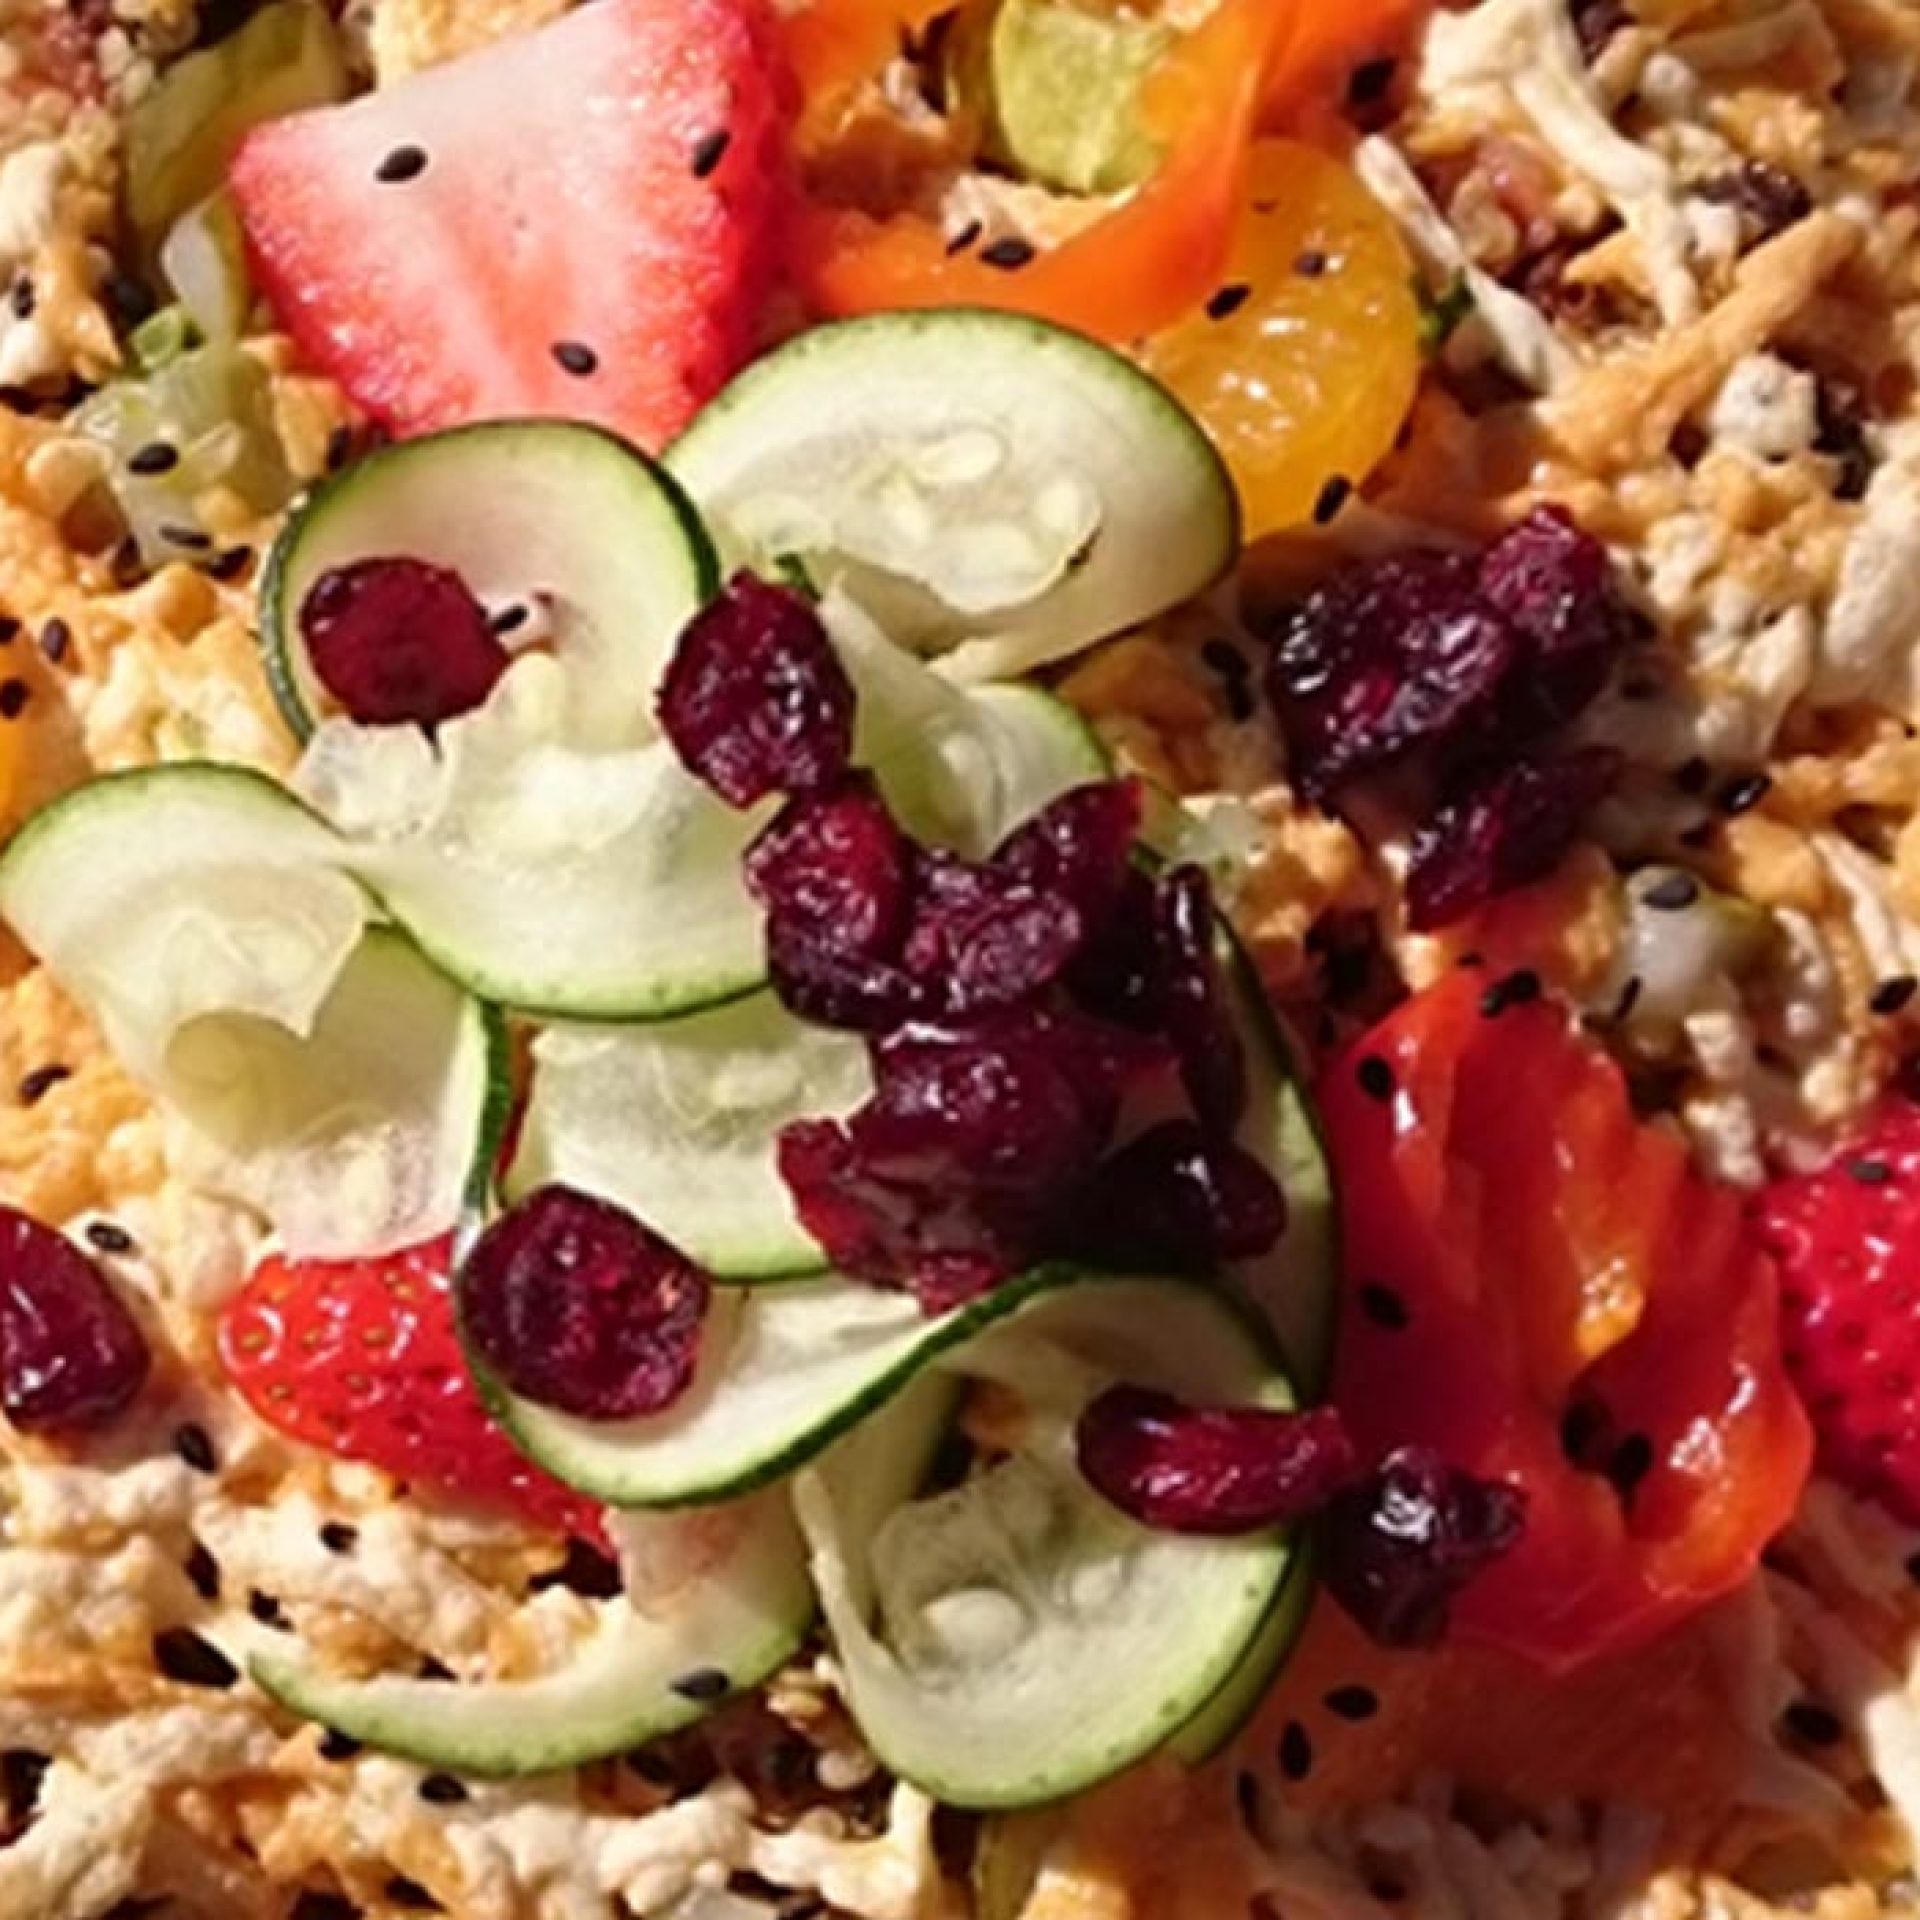 Healthy, vegan, vegetarian, gluten-free, dairy-free food in Banff Lake Louise